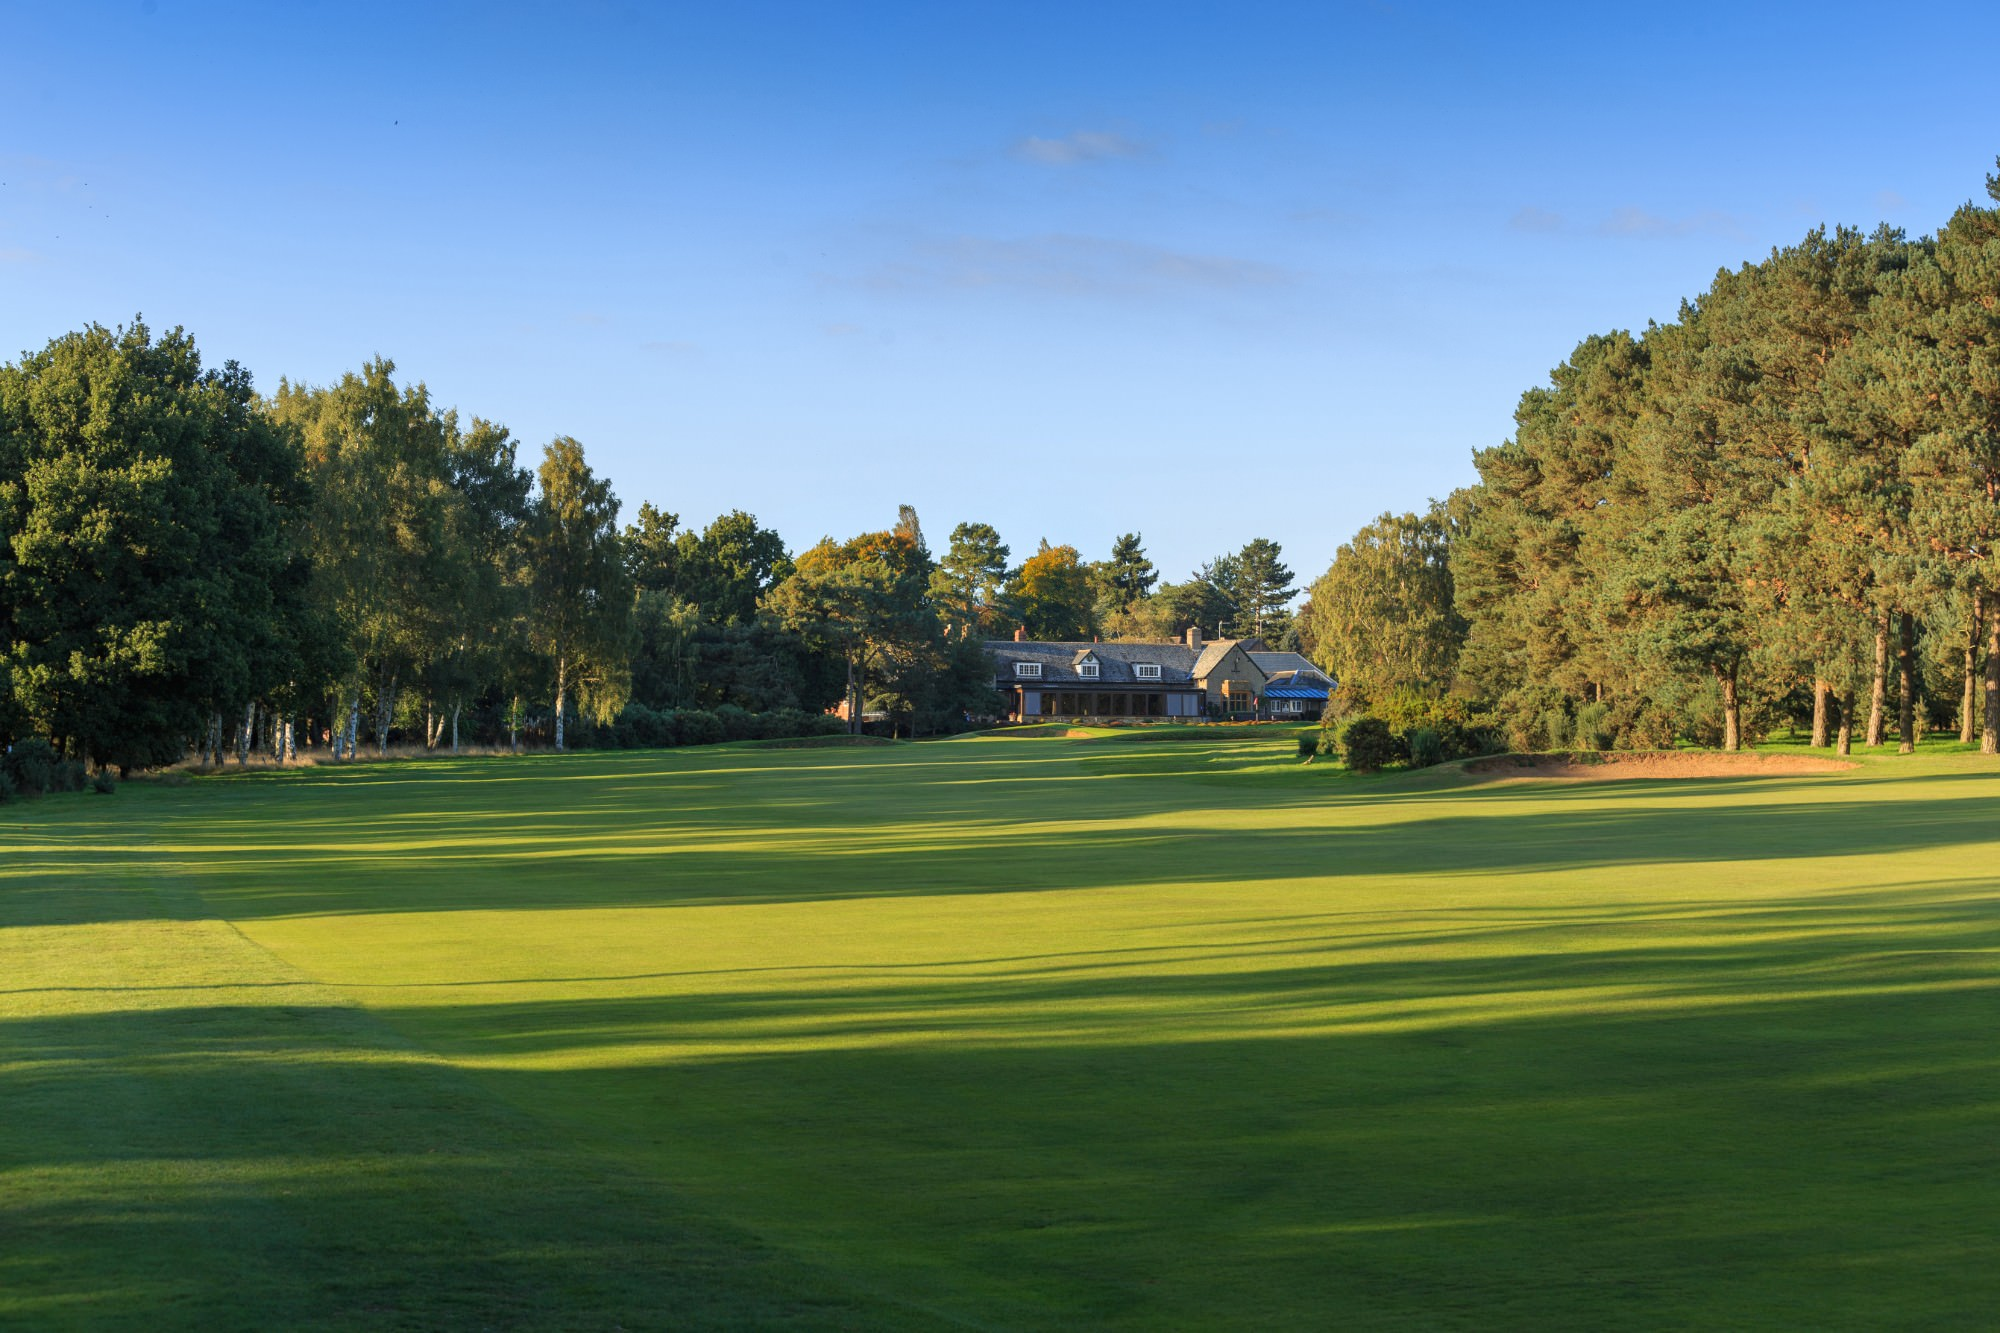 North Hants Golf Club   National Club Golfer Top 100 Courses